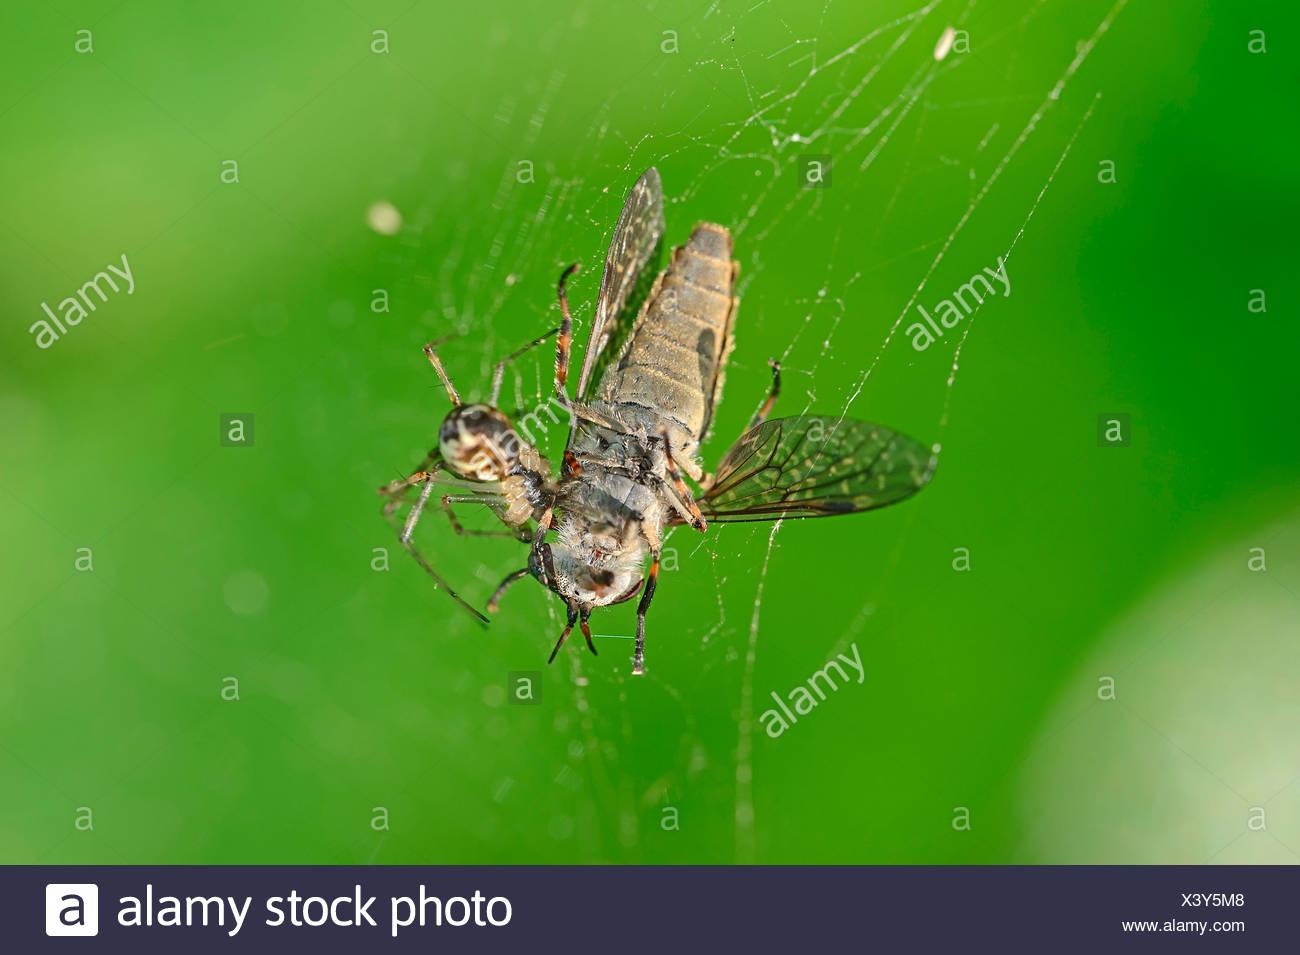 Sheet Web Spider - Stock Image